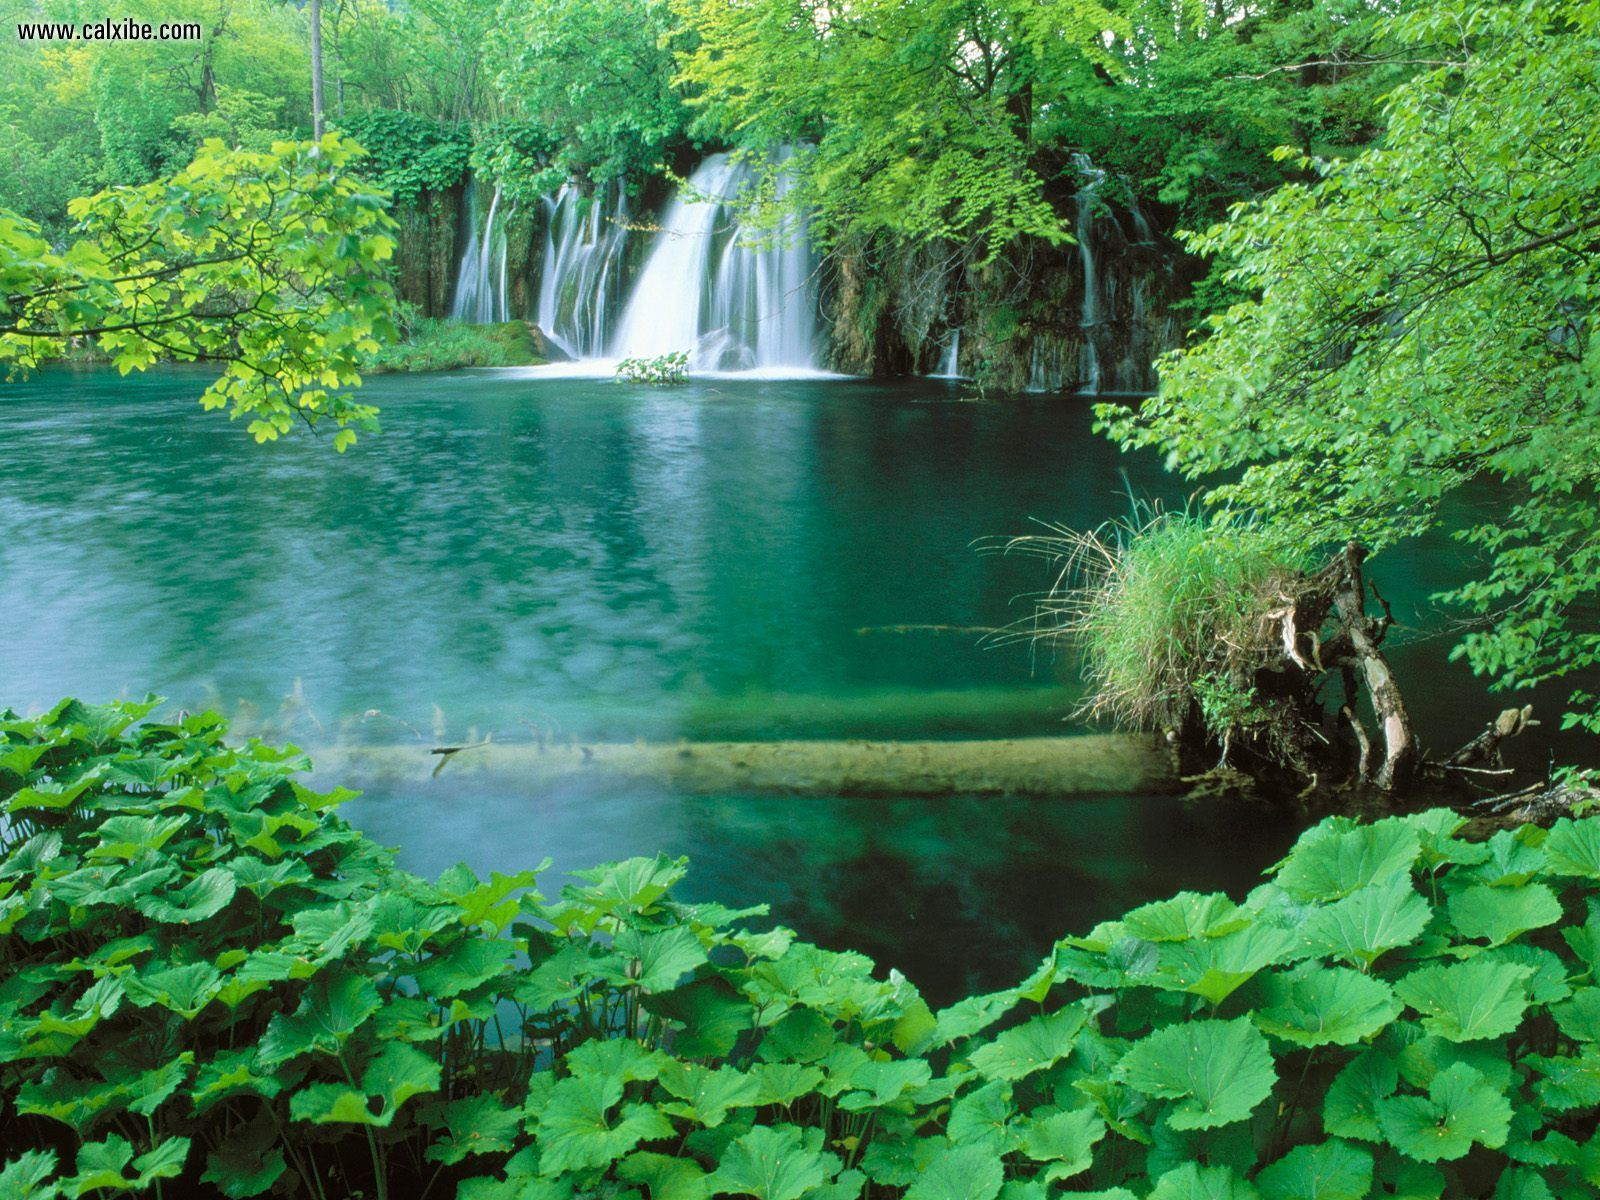 Plitvice Lakes National Park Croatia desktop wallpaper nr 17527 1600x1200